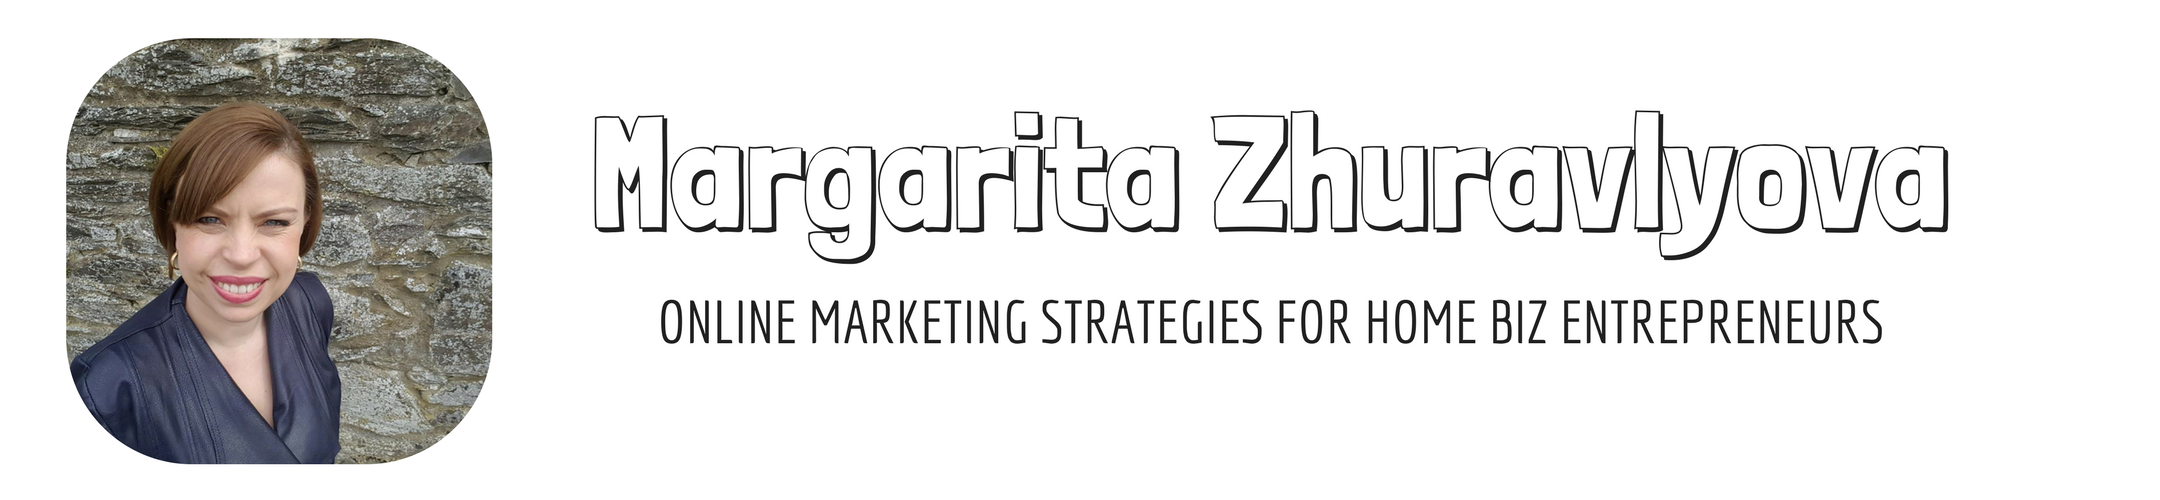 Work with Margarita